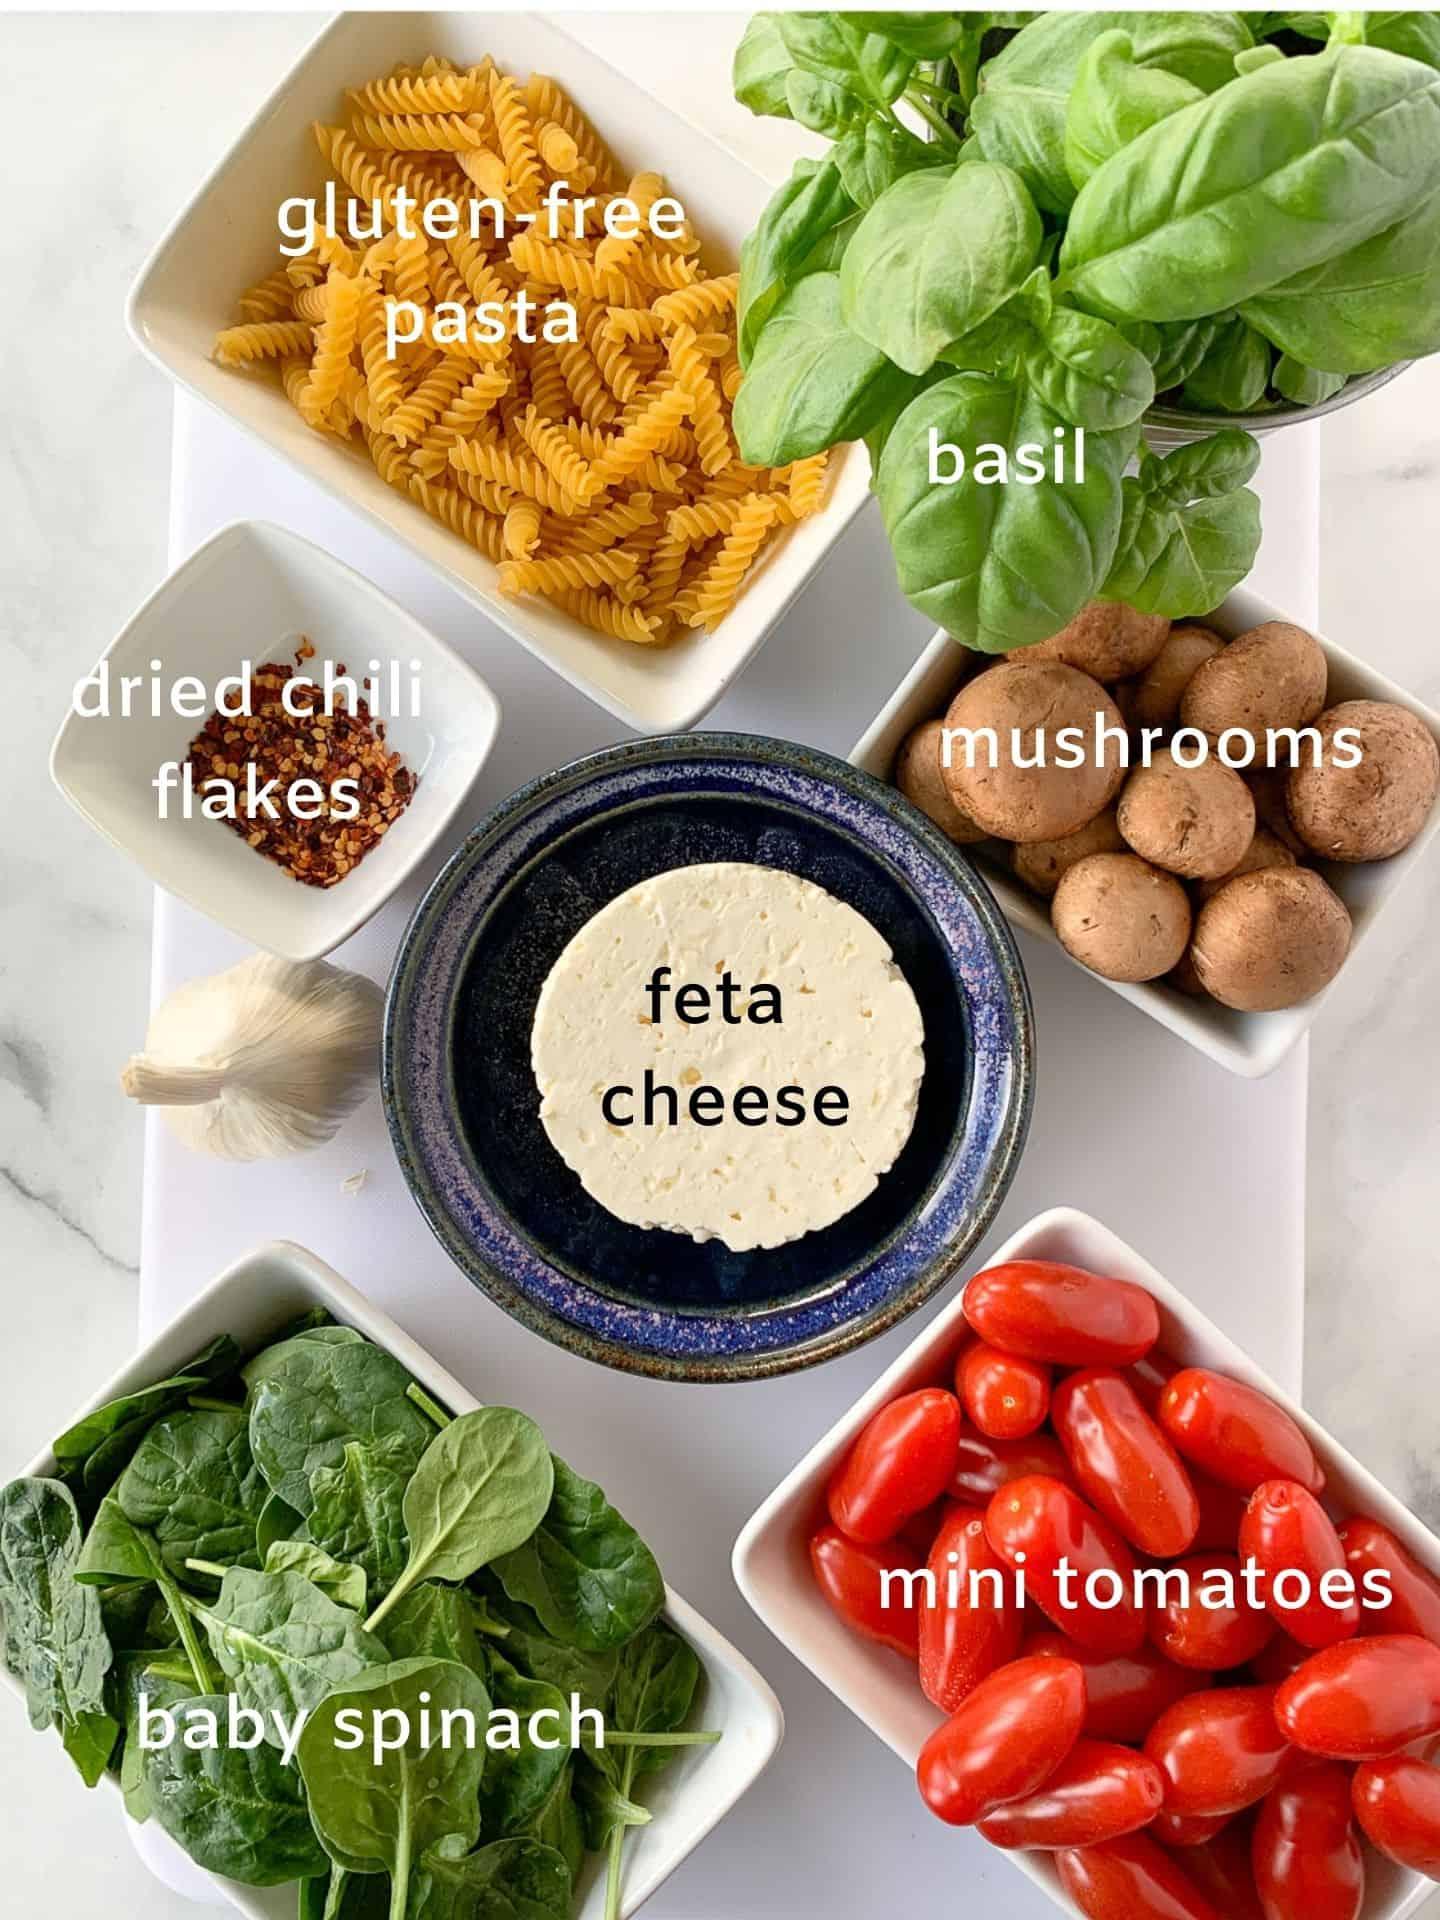 Labeled ingredients for feta tomato pasta bake